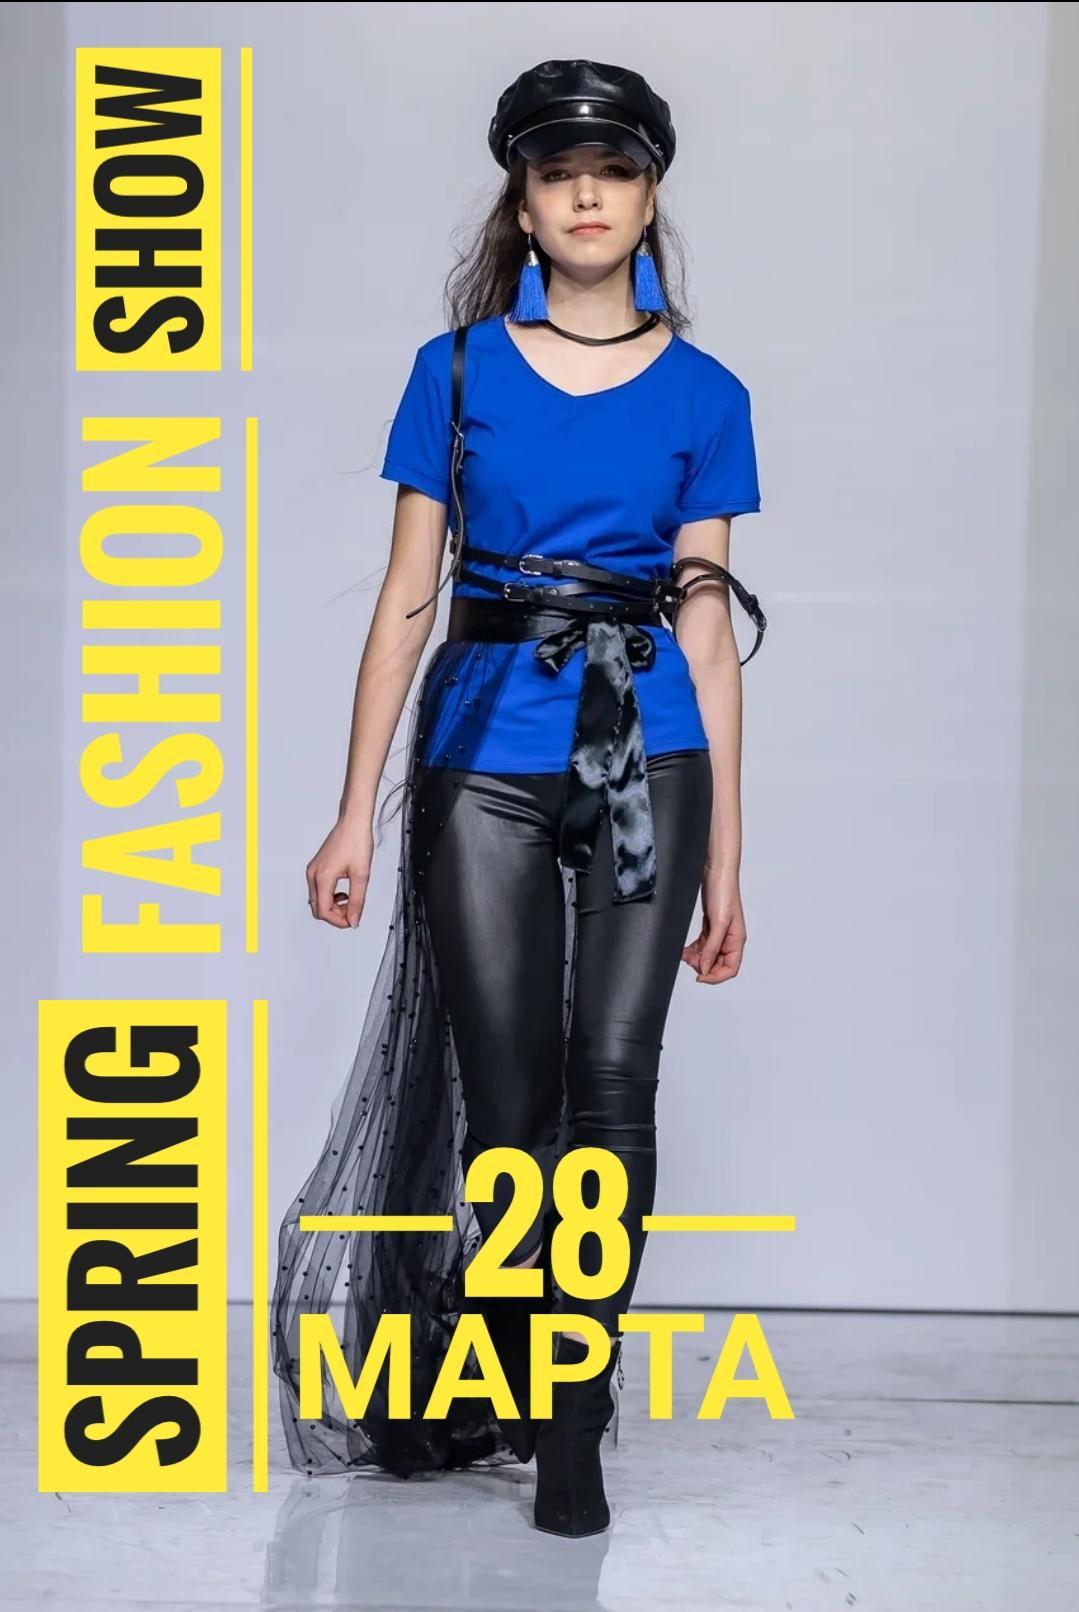 Показ SPRING FW Grande 28/03 девушки и юноши 15-18 лет